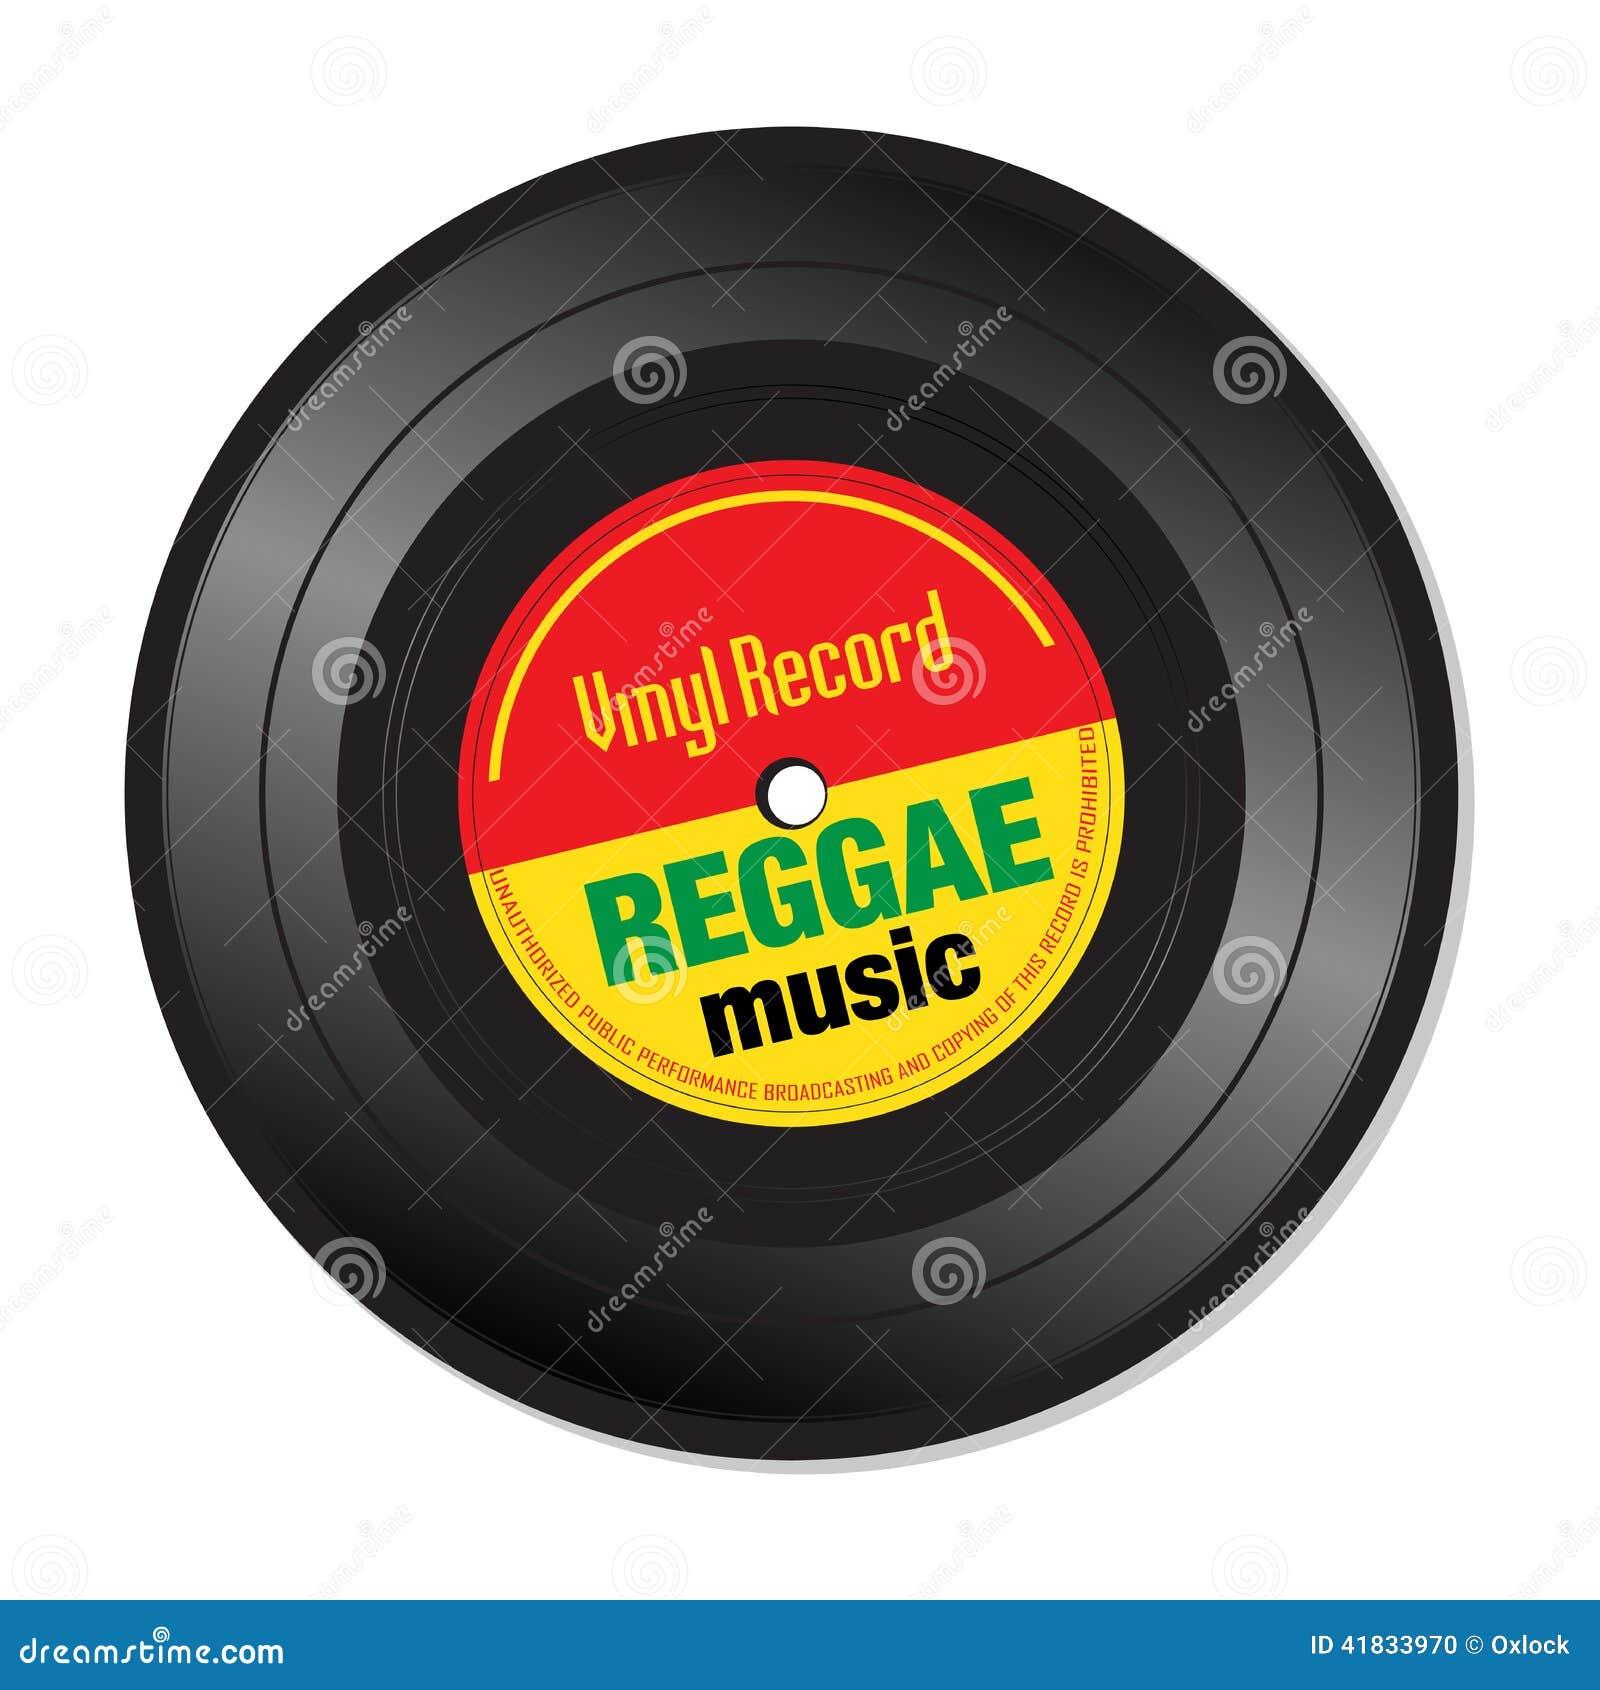 Reggae Music Vinyl Record Stock Vector Image Of Artwork